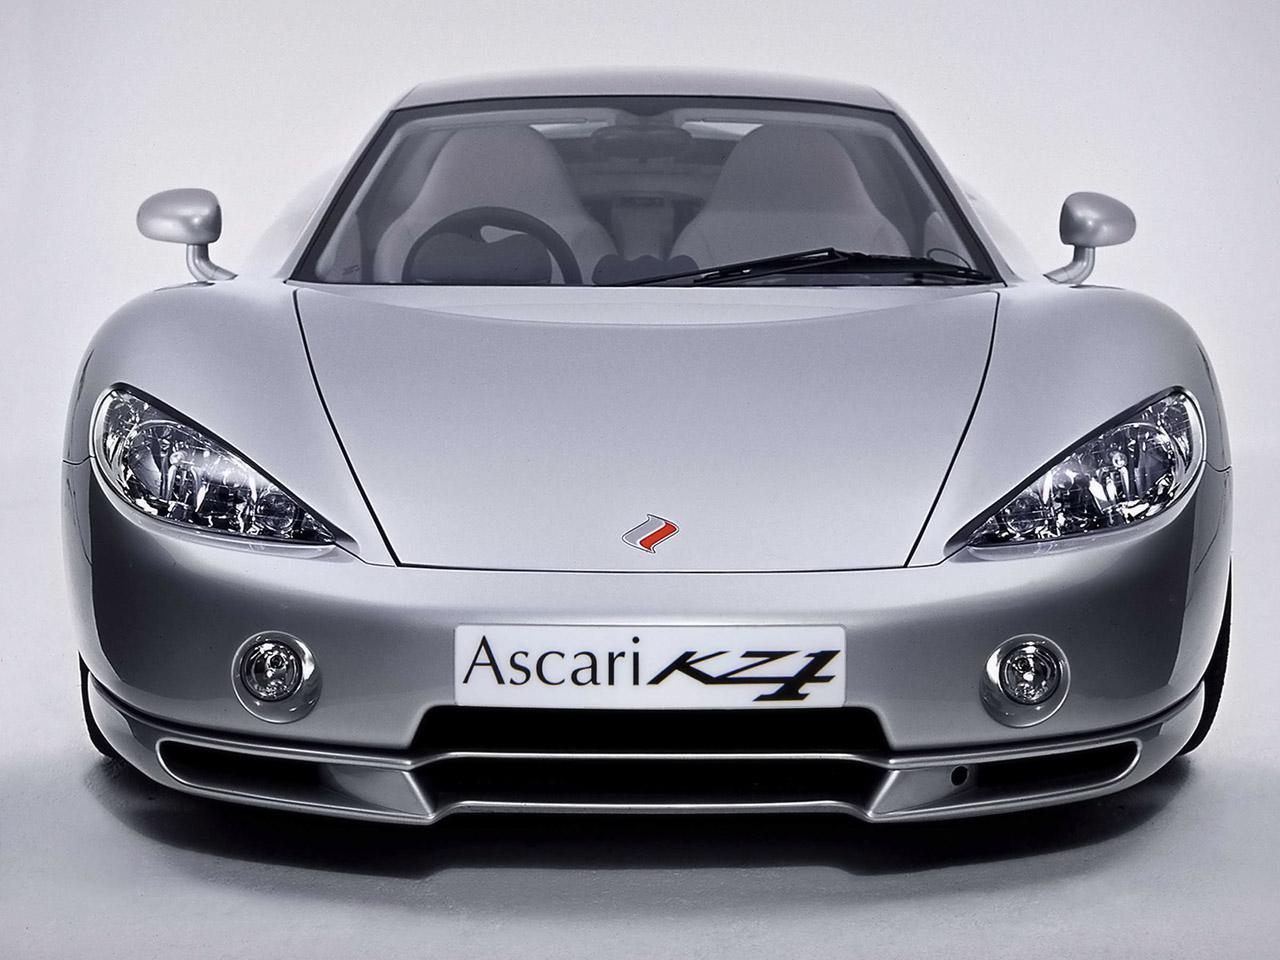 2006-Ascari-KZ1-F-Studio-1280x960-1-